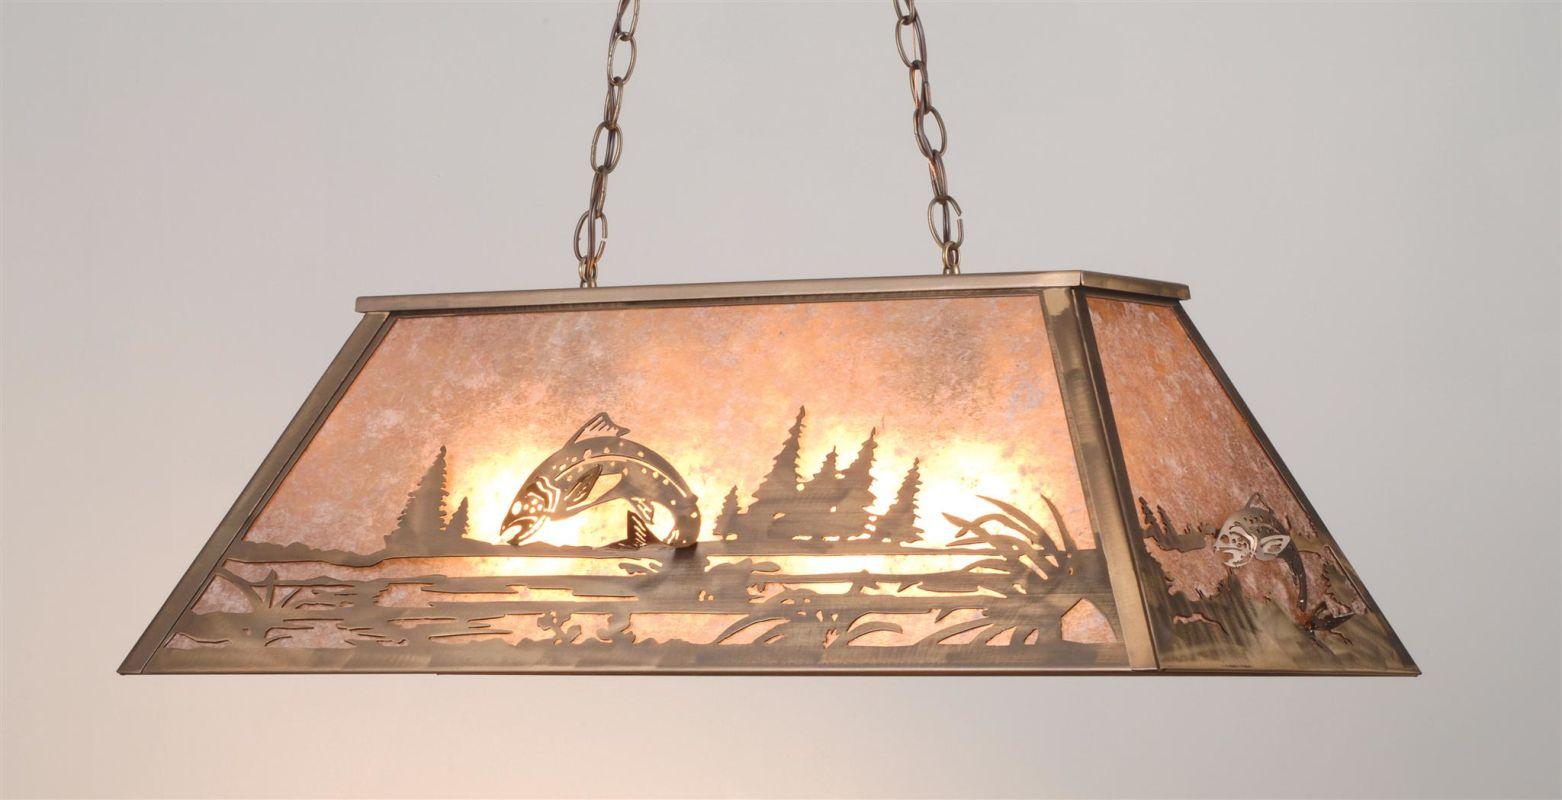 Meyda Tiffany 98682 Six Light Island / Billiard Fixture Antique Copper